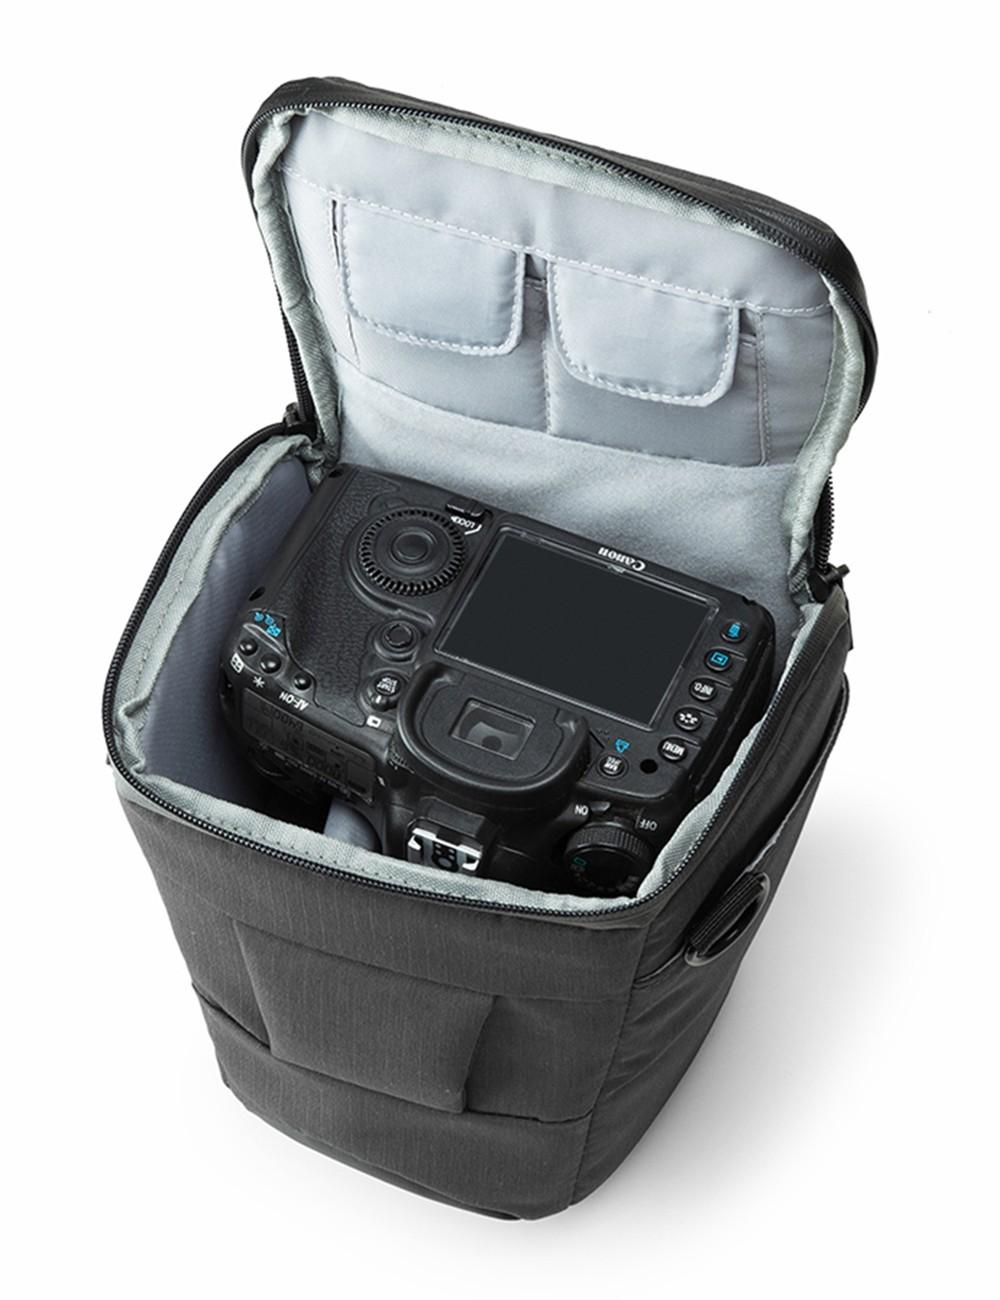 Messenger Style Camera Bag Manufacturers, Messenger Style Camera Bag Factory, Supply Messenger Style Camera Bag